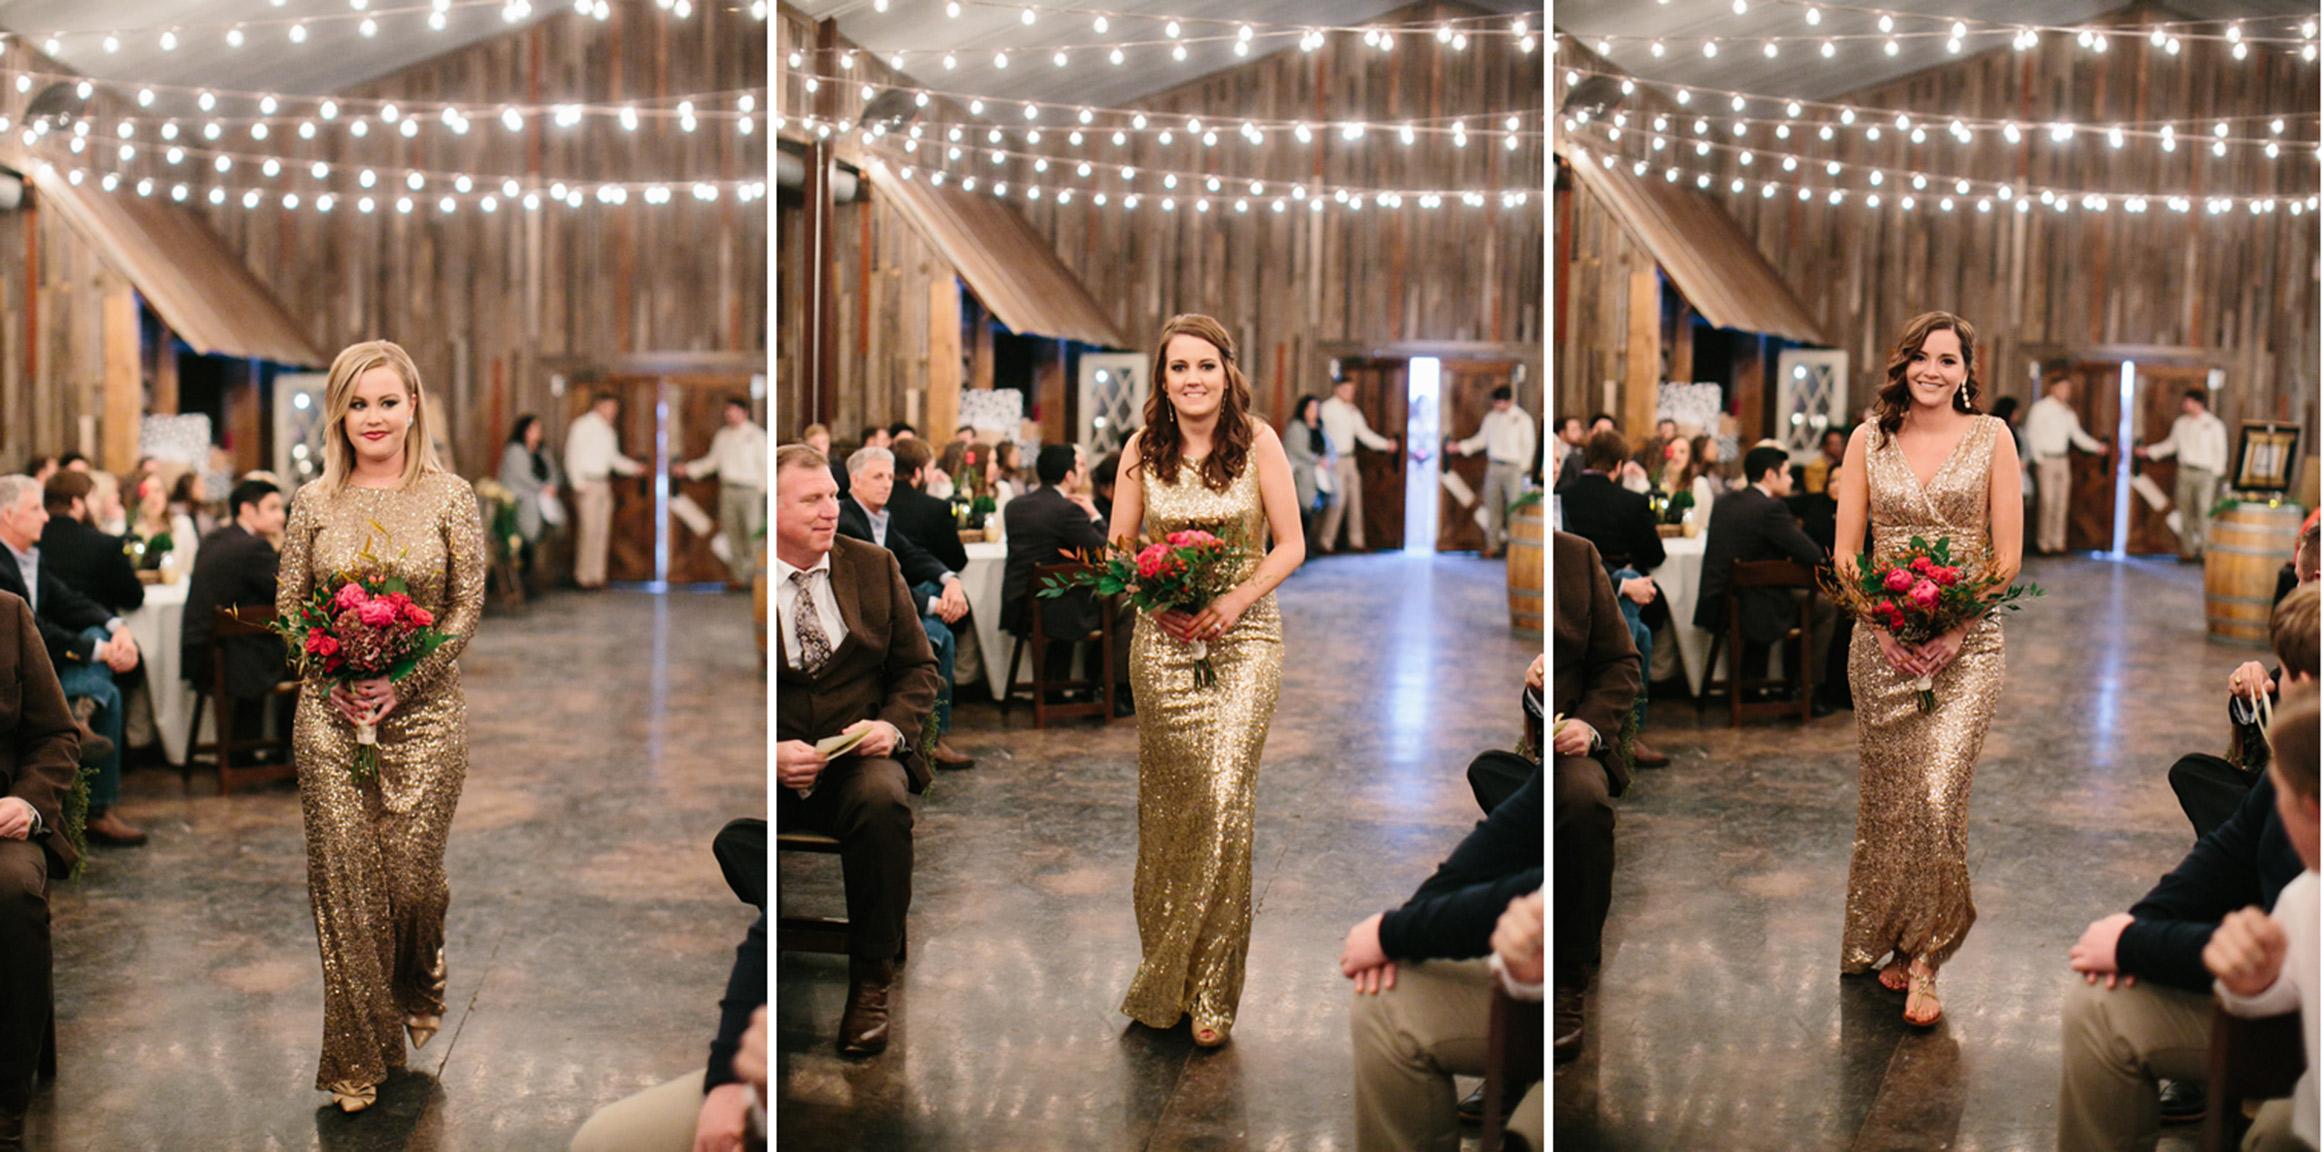 Cotton_Creek_Barn_Winter_Wedding_WeddingPhotographer043.jpg